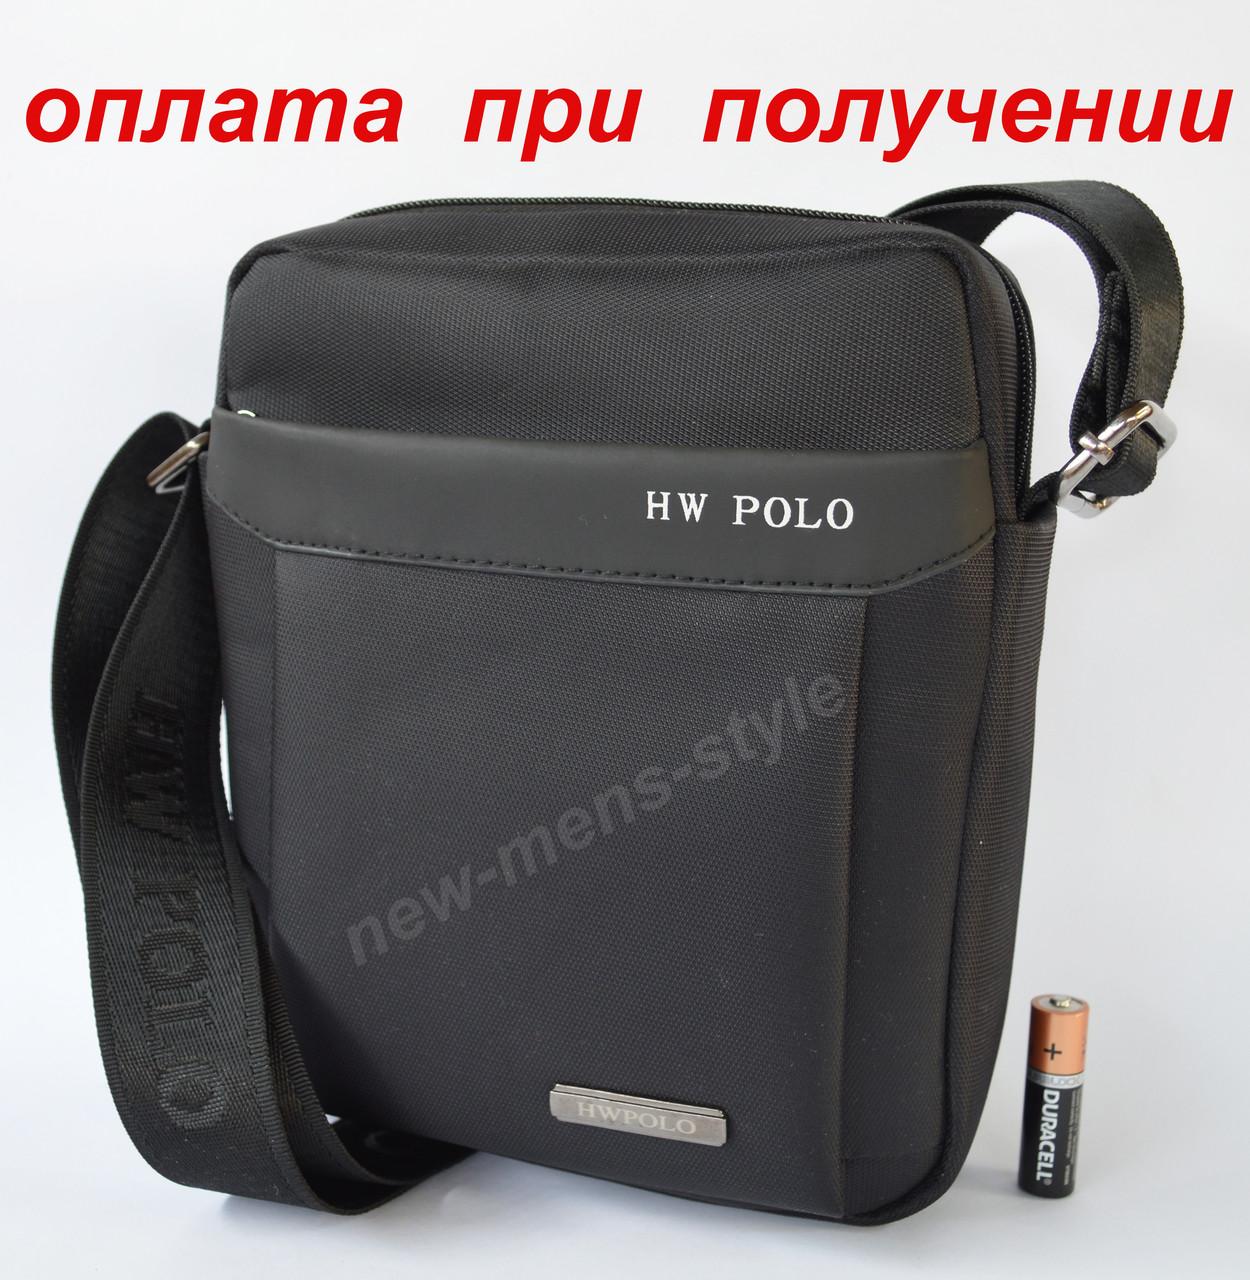 f8b0e37aa8f5 Мужская через плечо тканевая сумка слинг рюкзак барсетка Polo купить